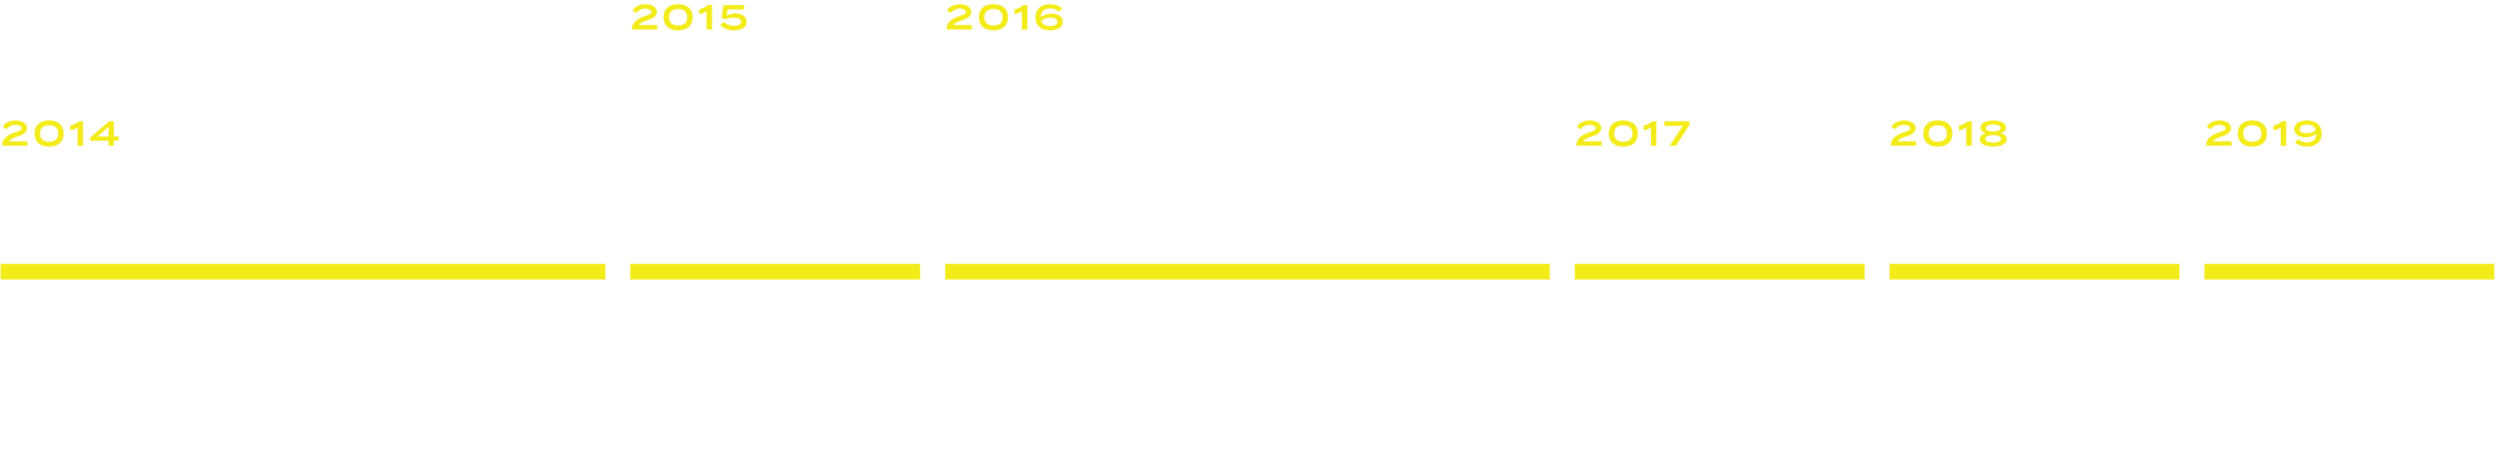 Eco-Timeline 2